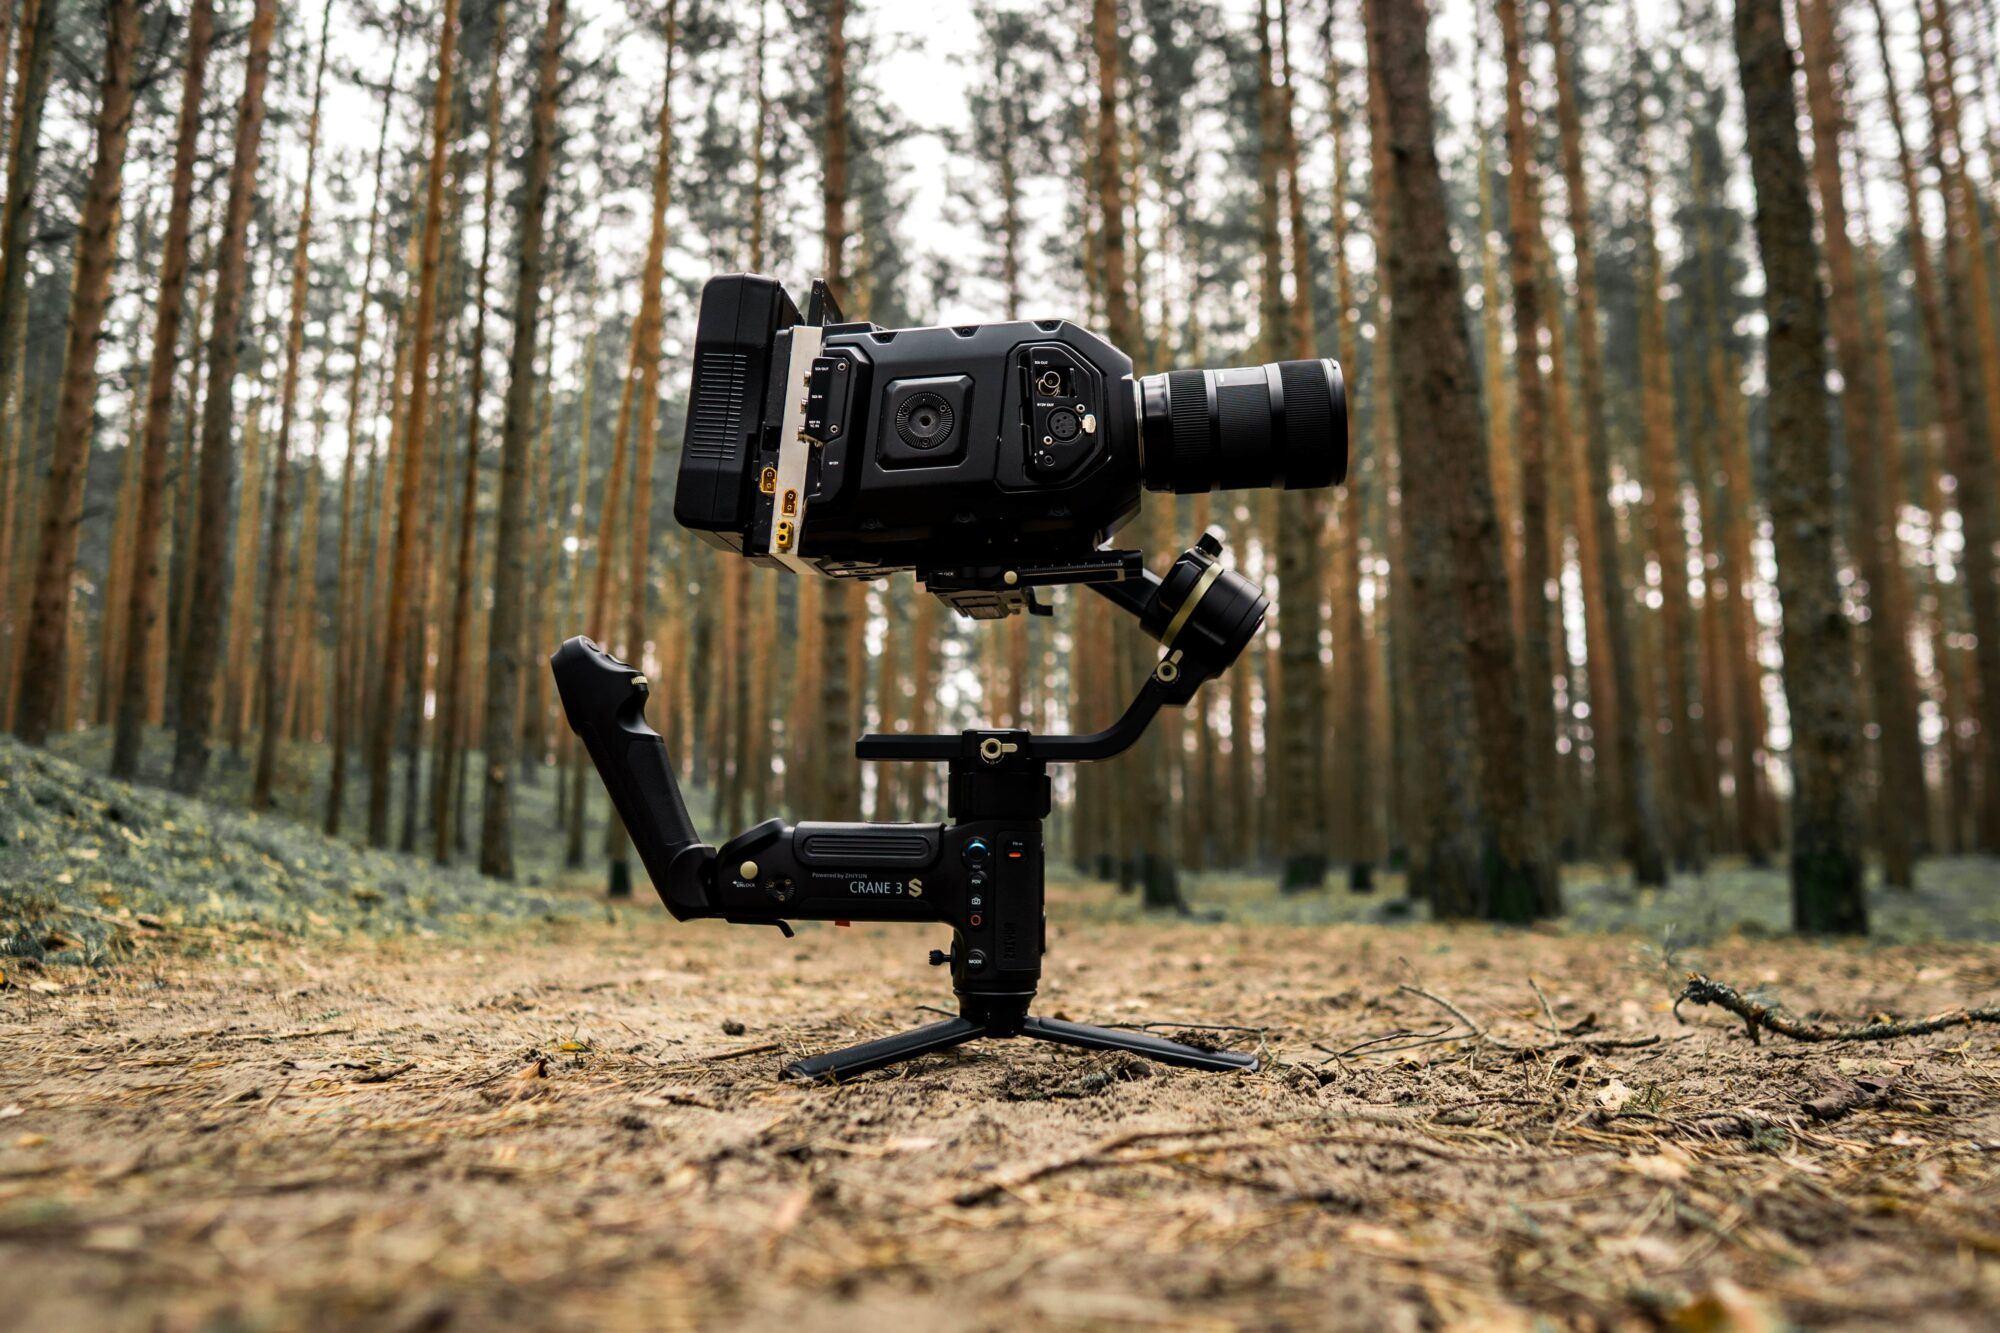 zhiyun-crane-3S-stabilisateur-appareil-photo-smartphone-1